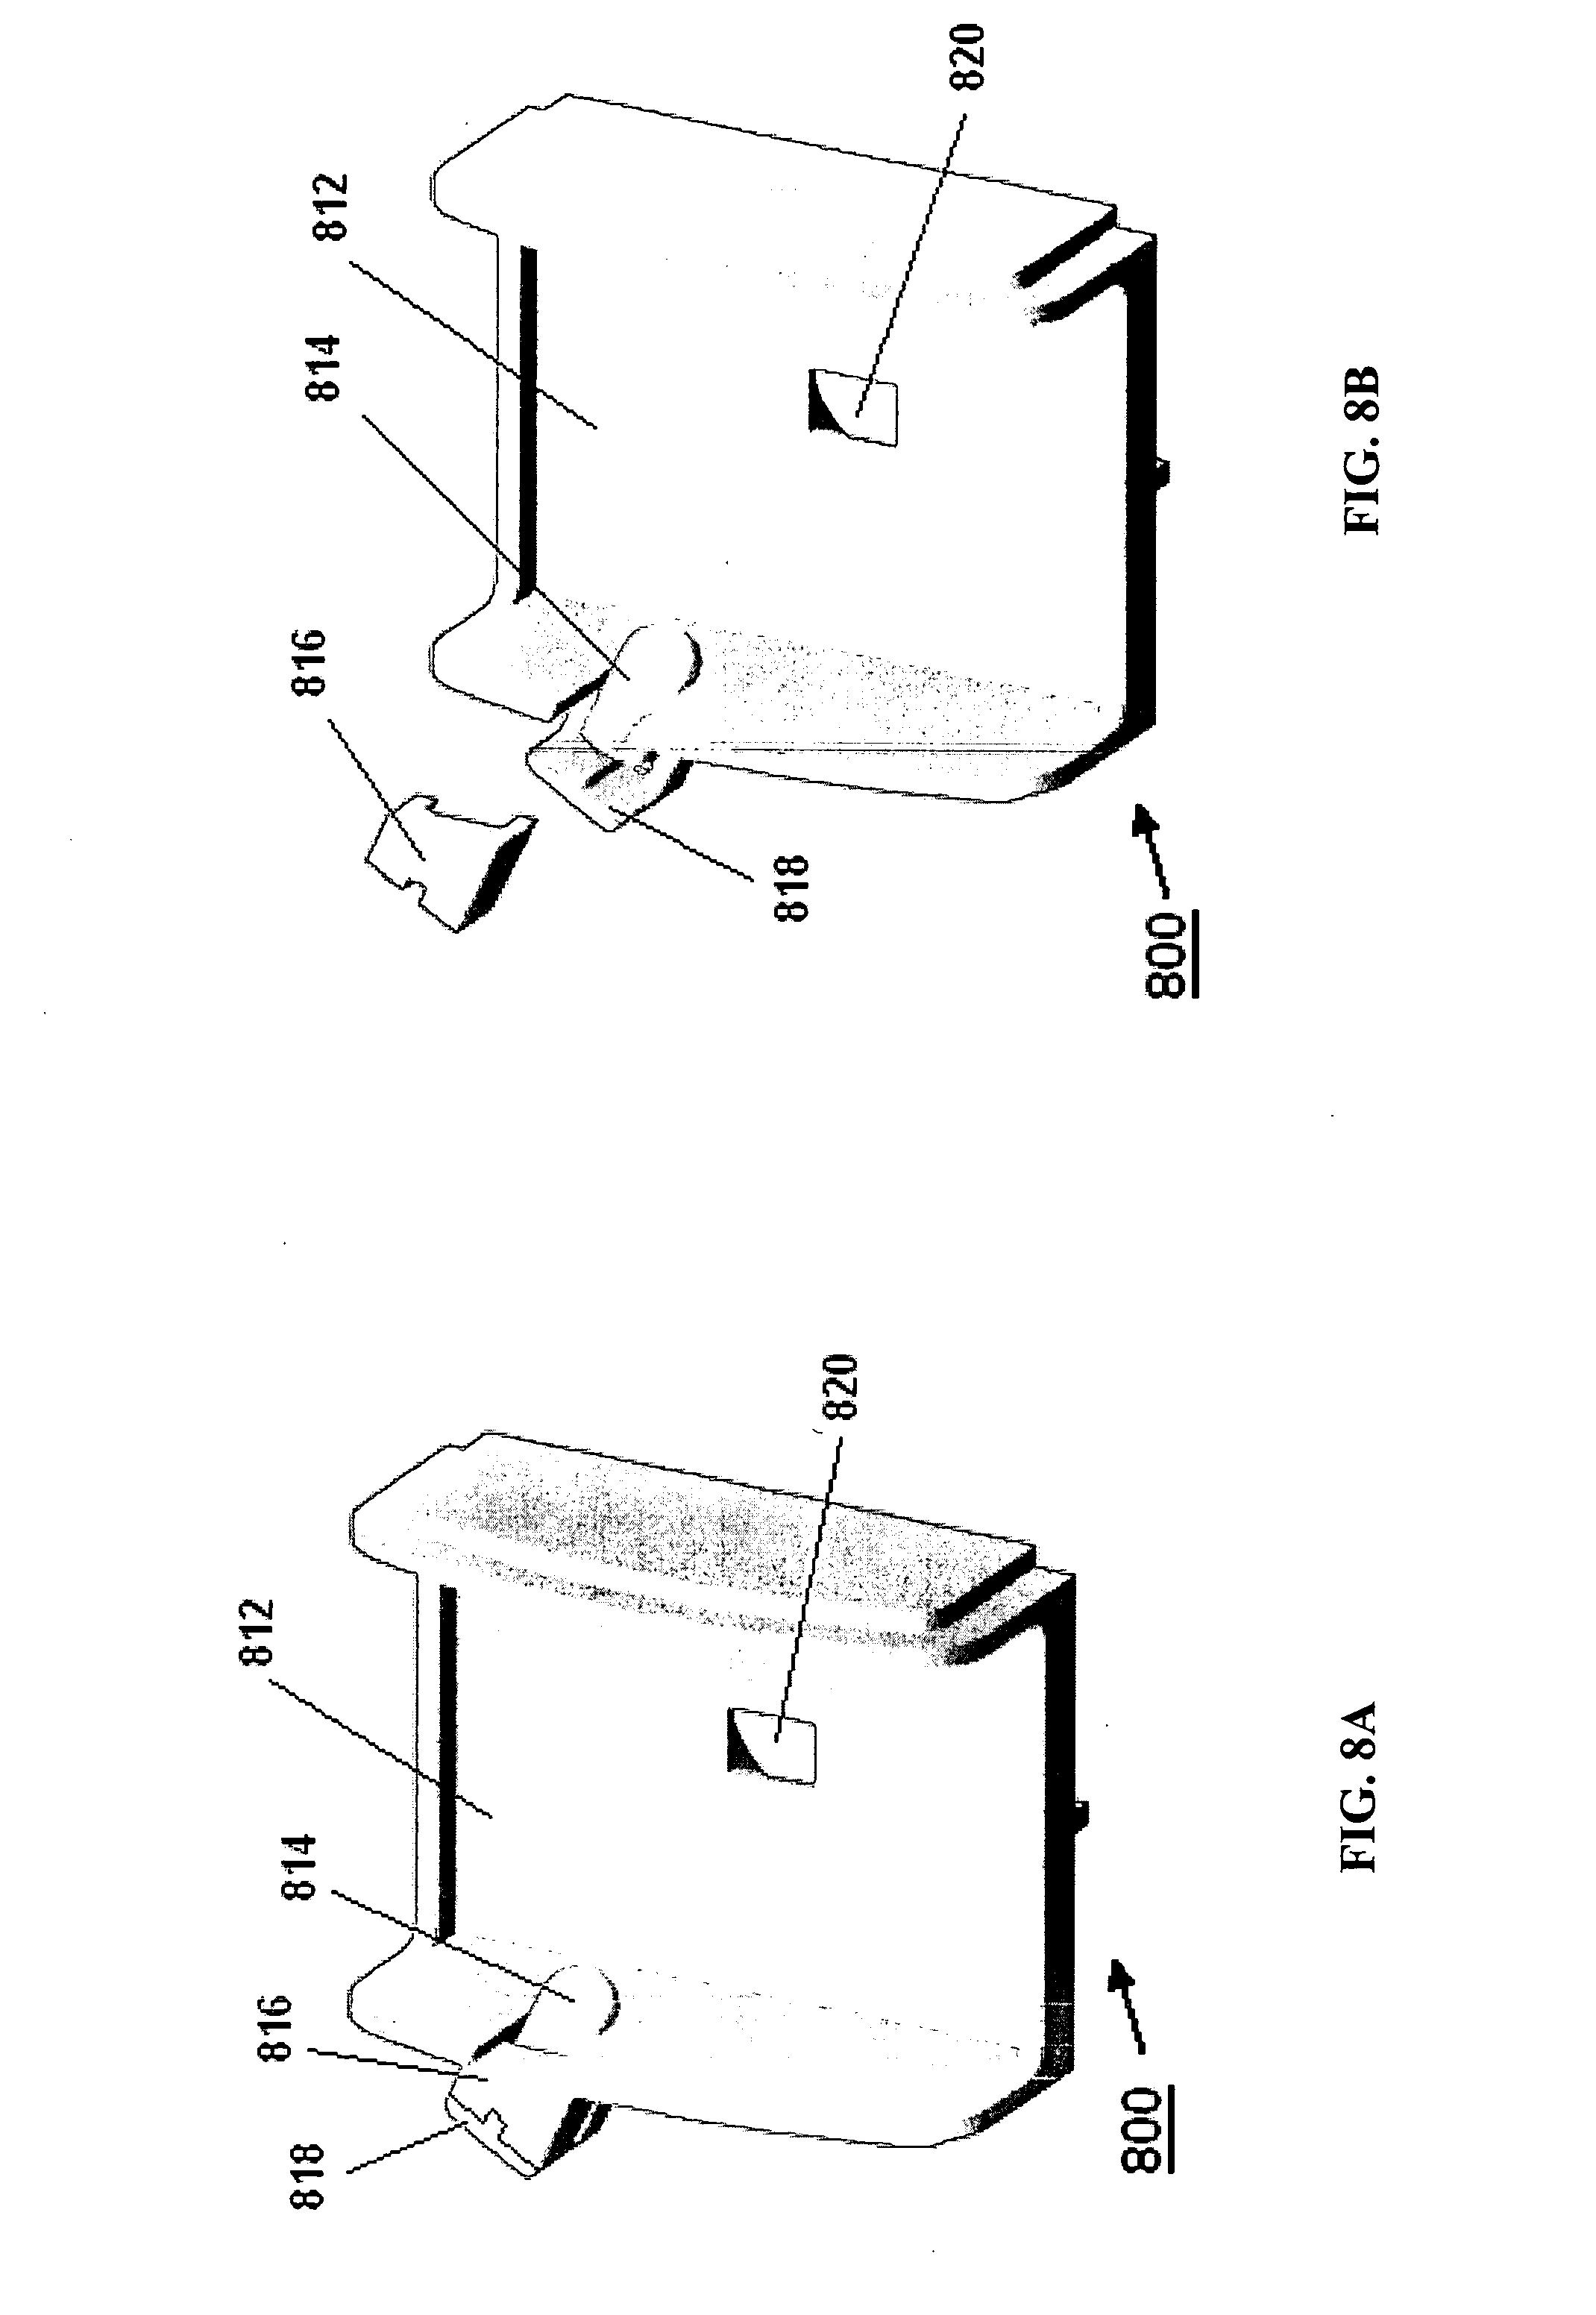 Occupancy Light Sensor Schaltplang Auto Electrical Wiring Diagram Hyundai Santro Fuse Box Patent Us20080079568